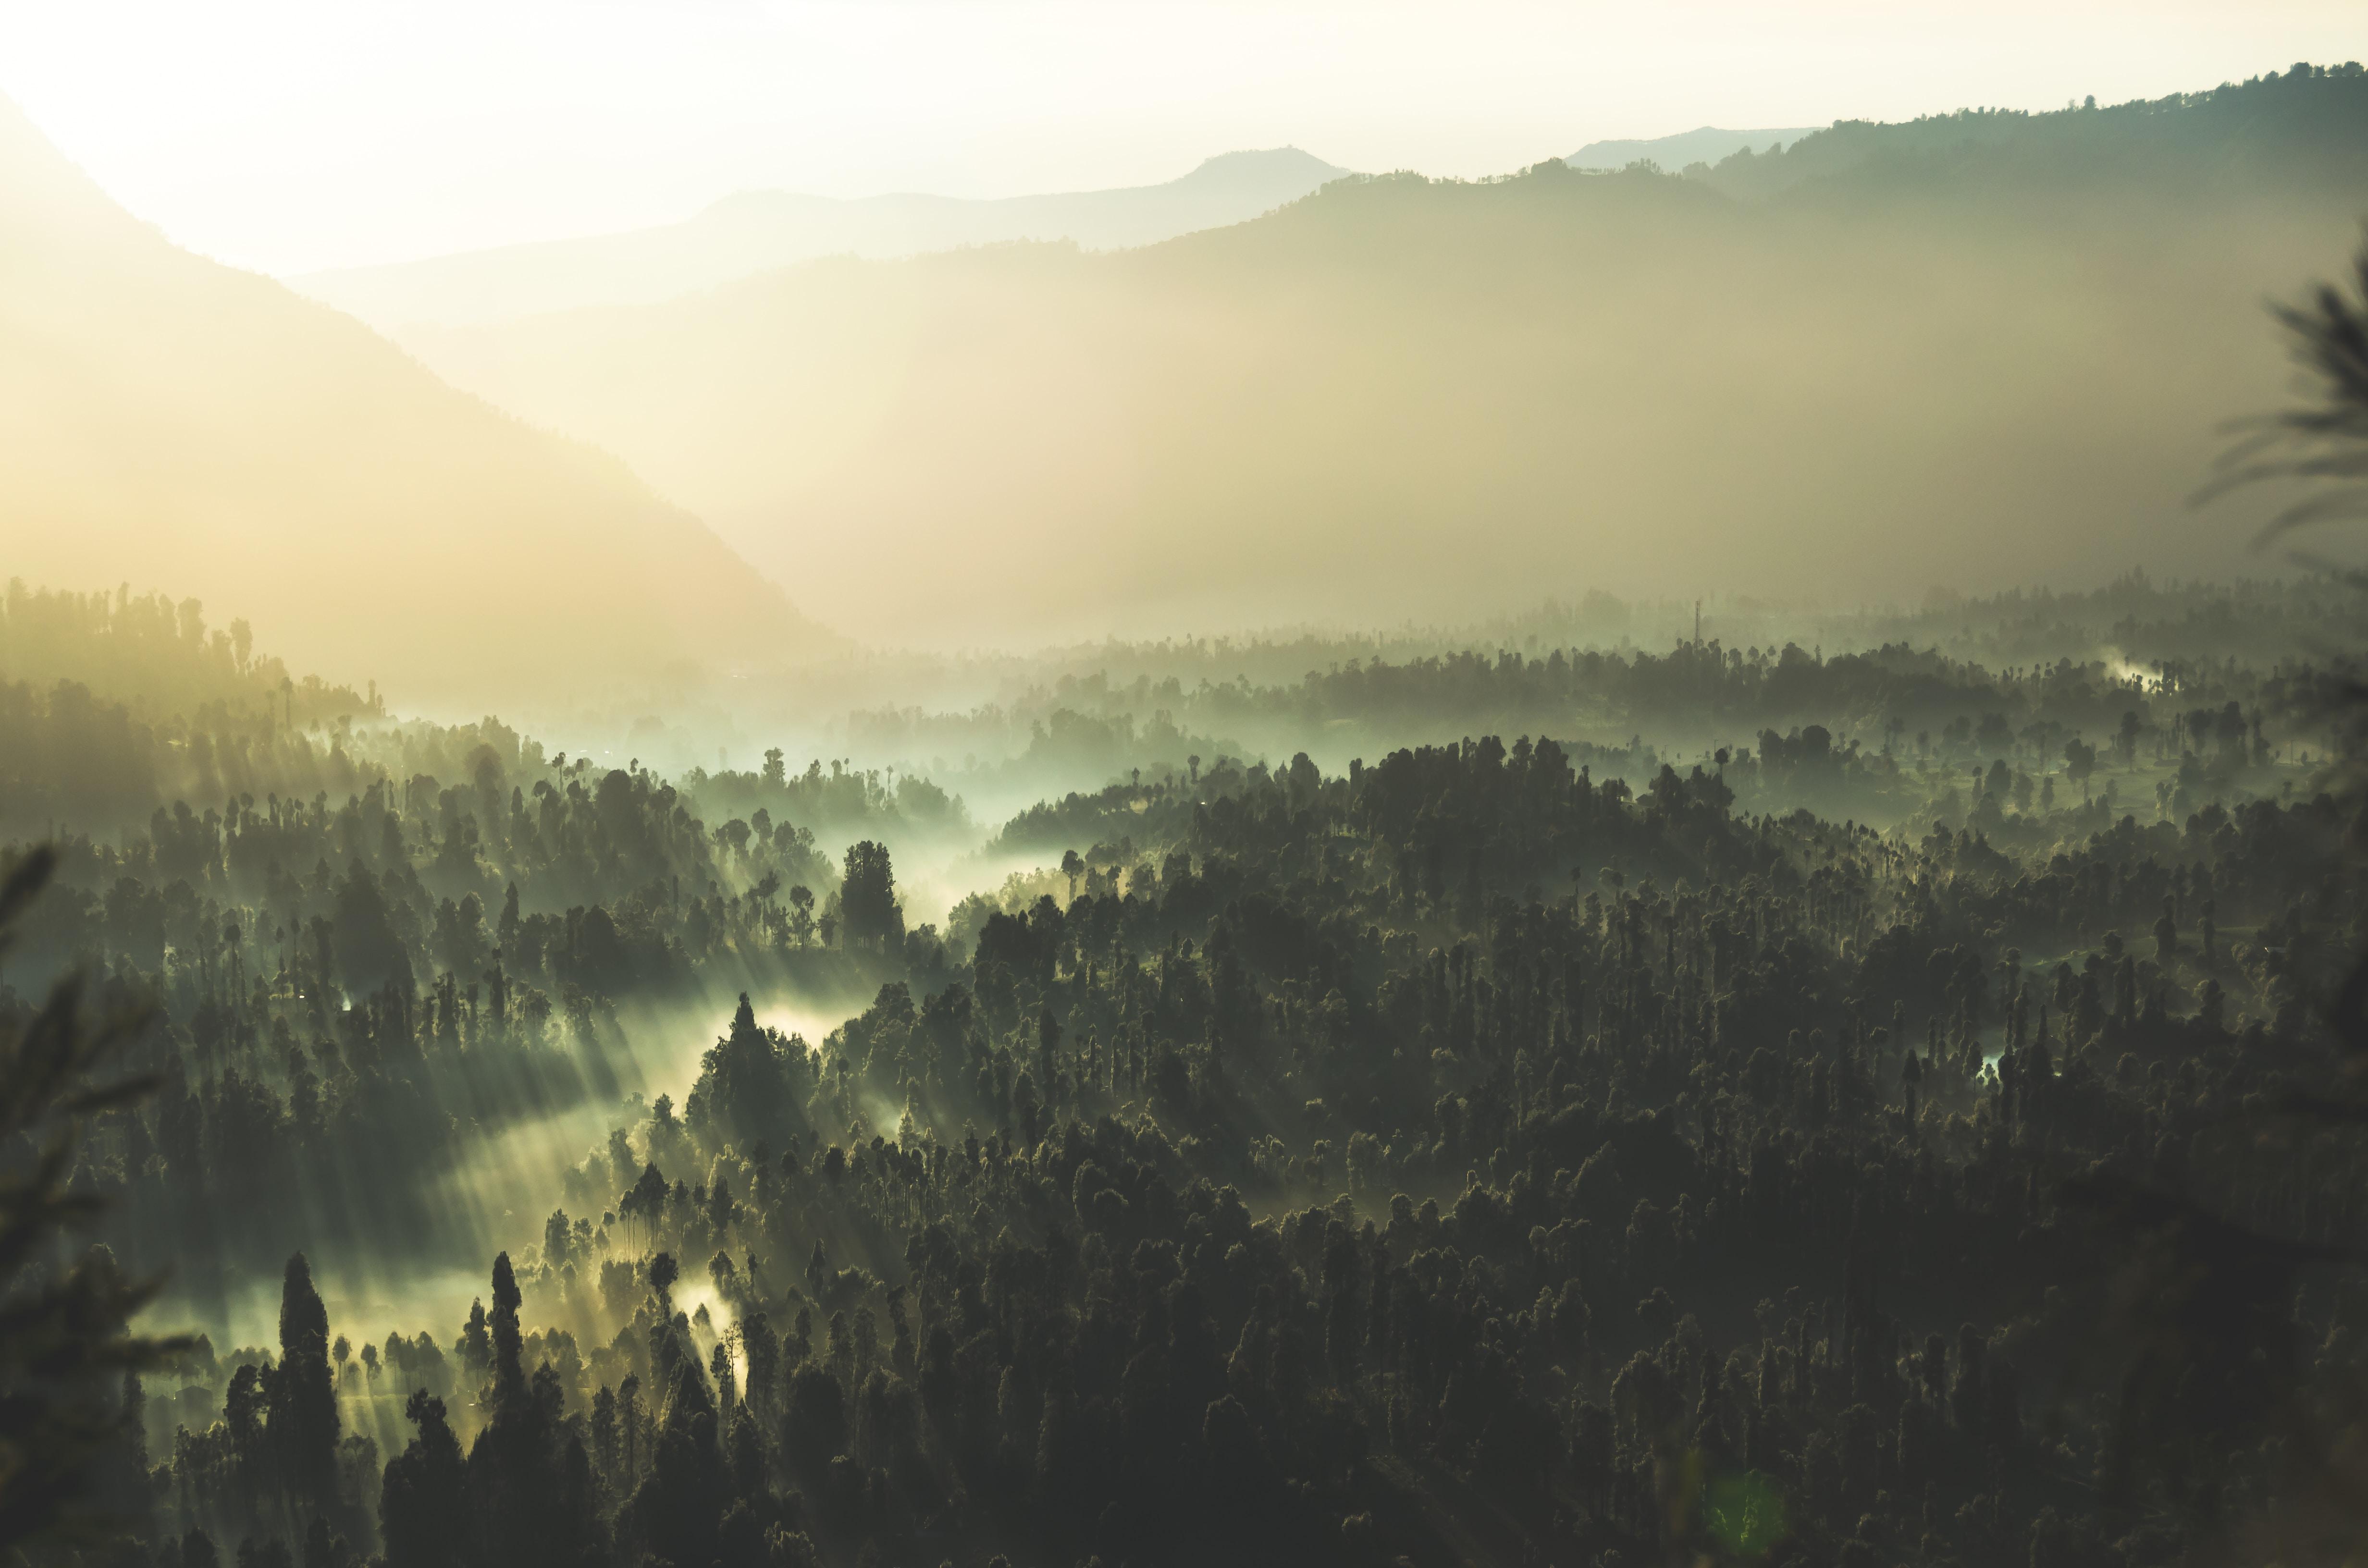 Rays of sun shining through the fog onto the trees of the Bromo Tengger Semeru National Park